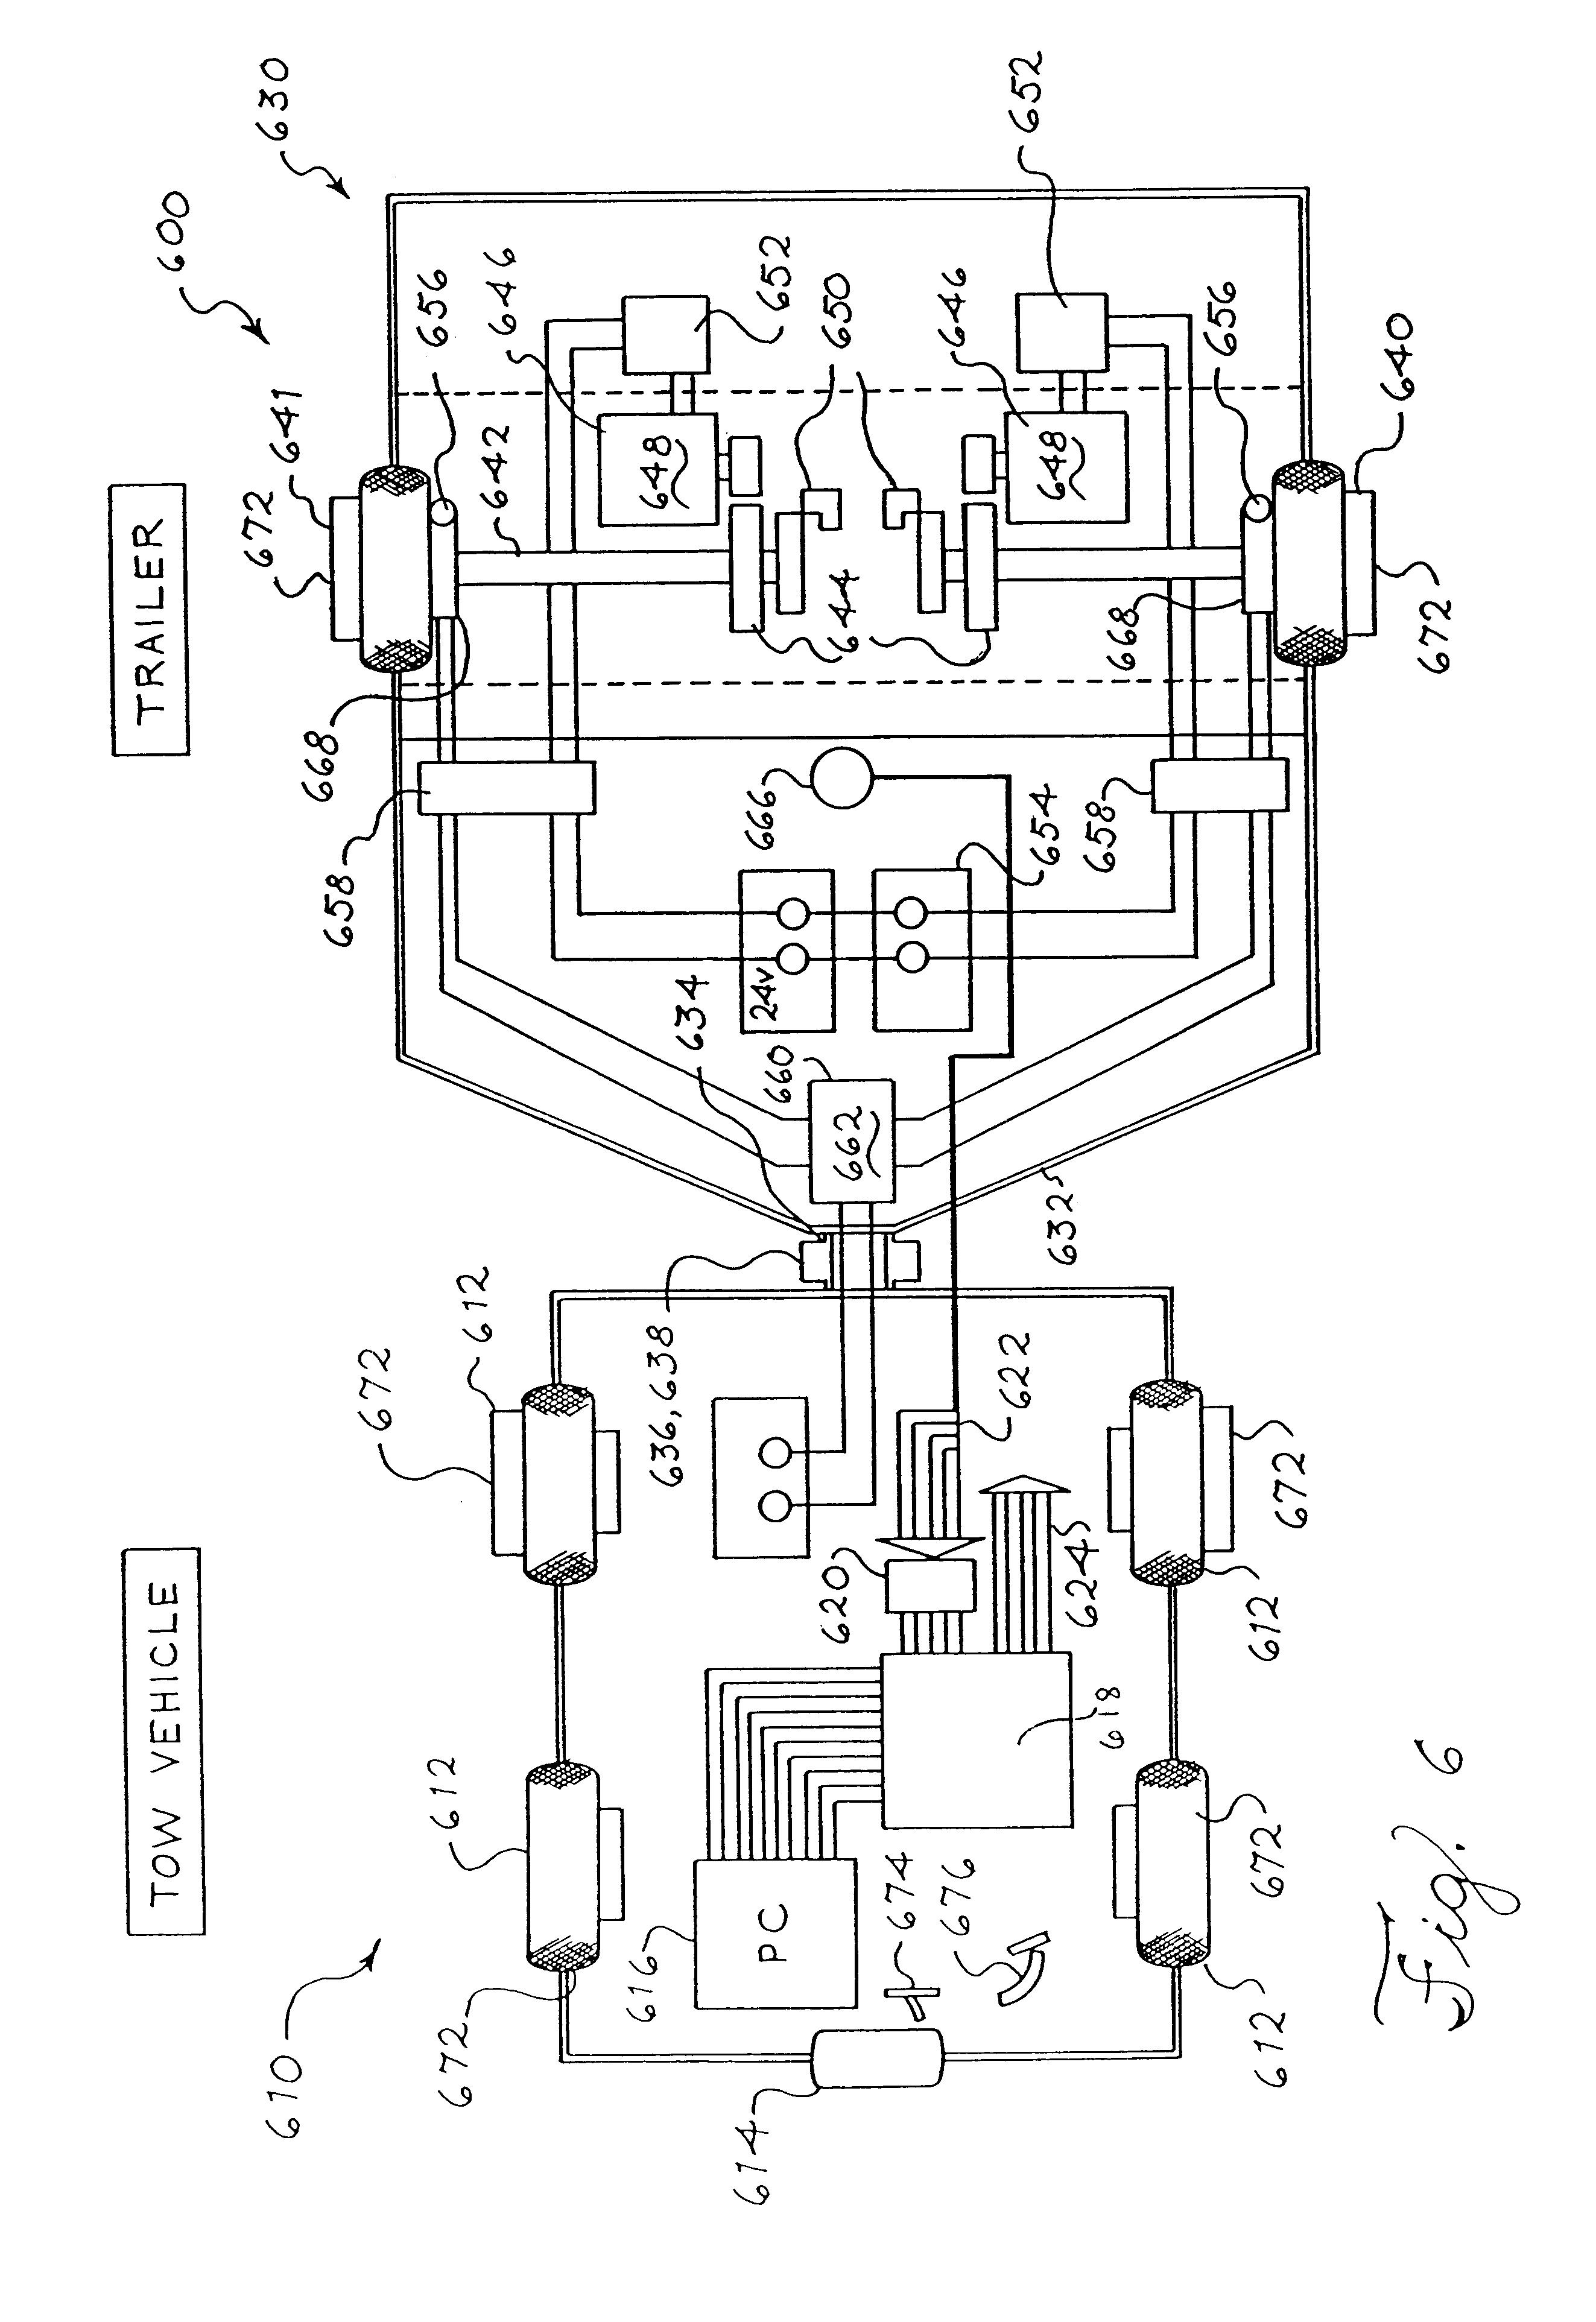 Wabco Vcs 2 Wiring Diagram